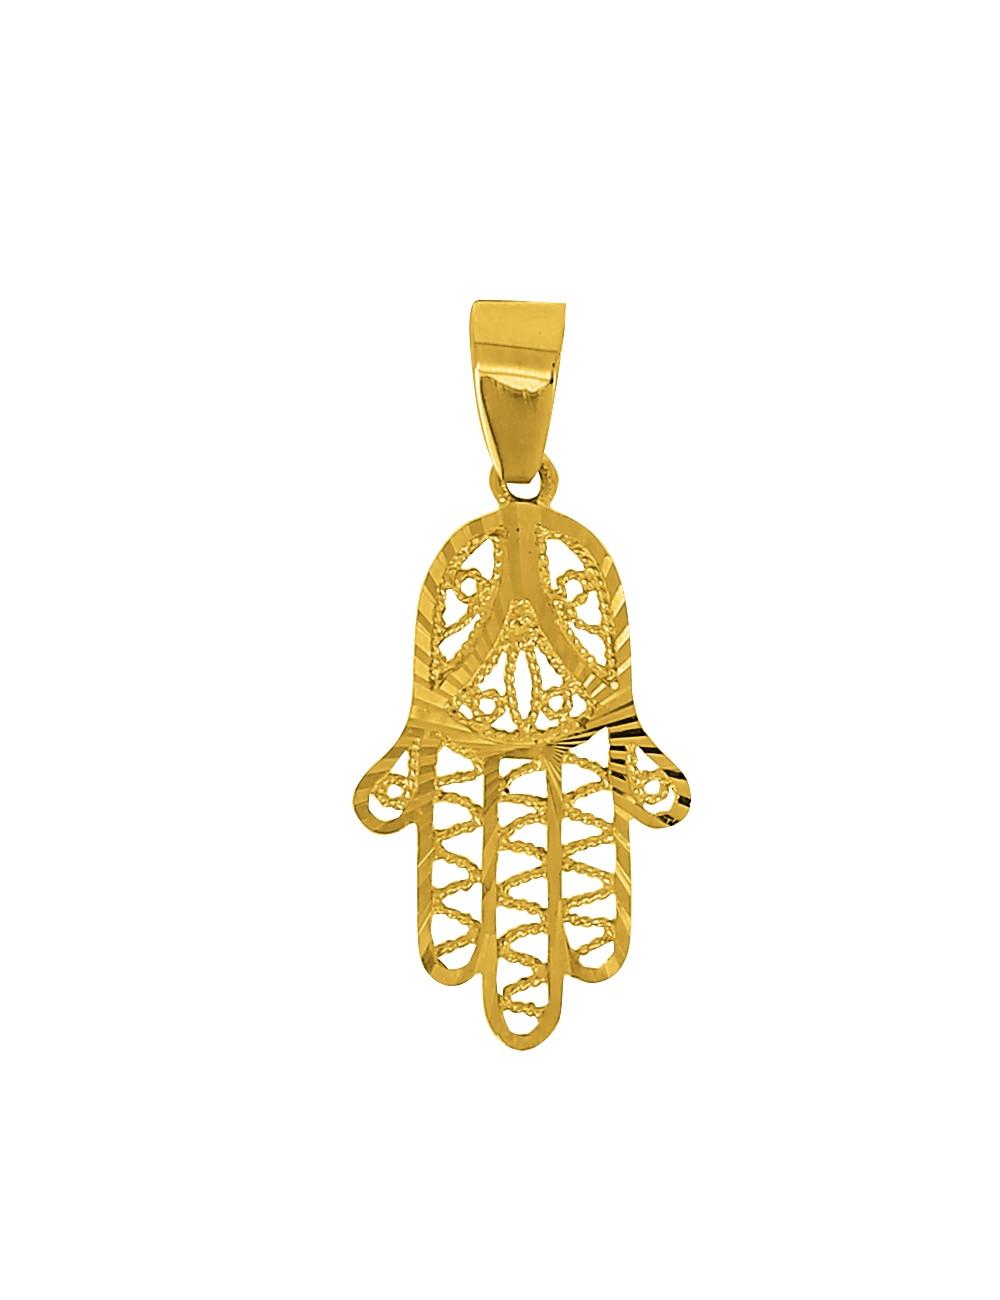 Pendentif Main Filigrane Or Jaune 18 Carats + Chaine en Or OFFERTE